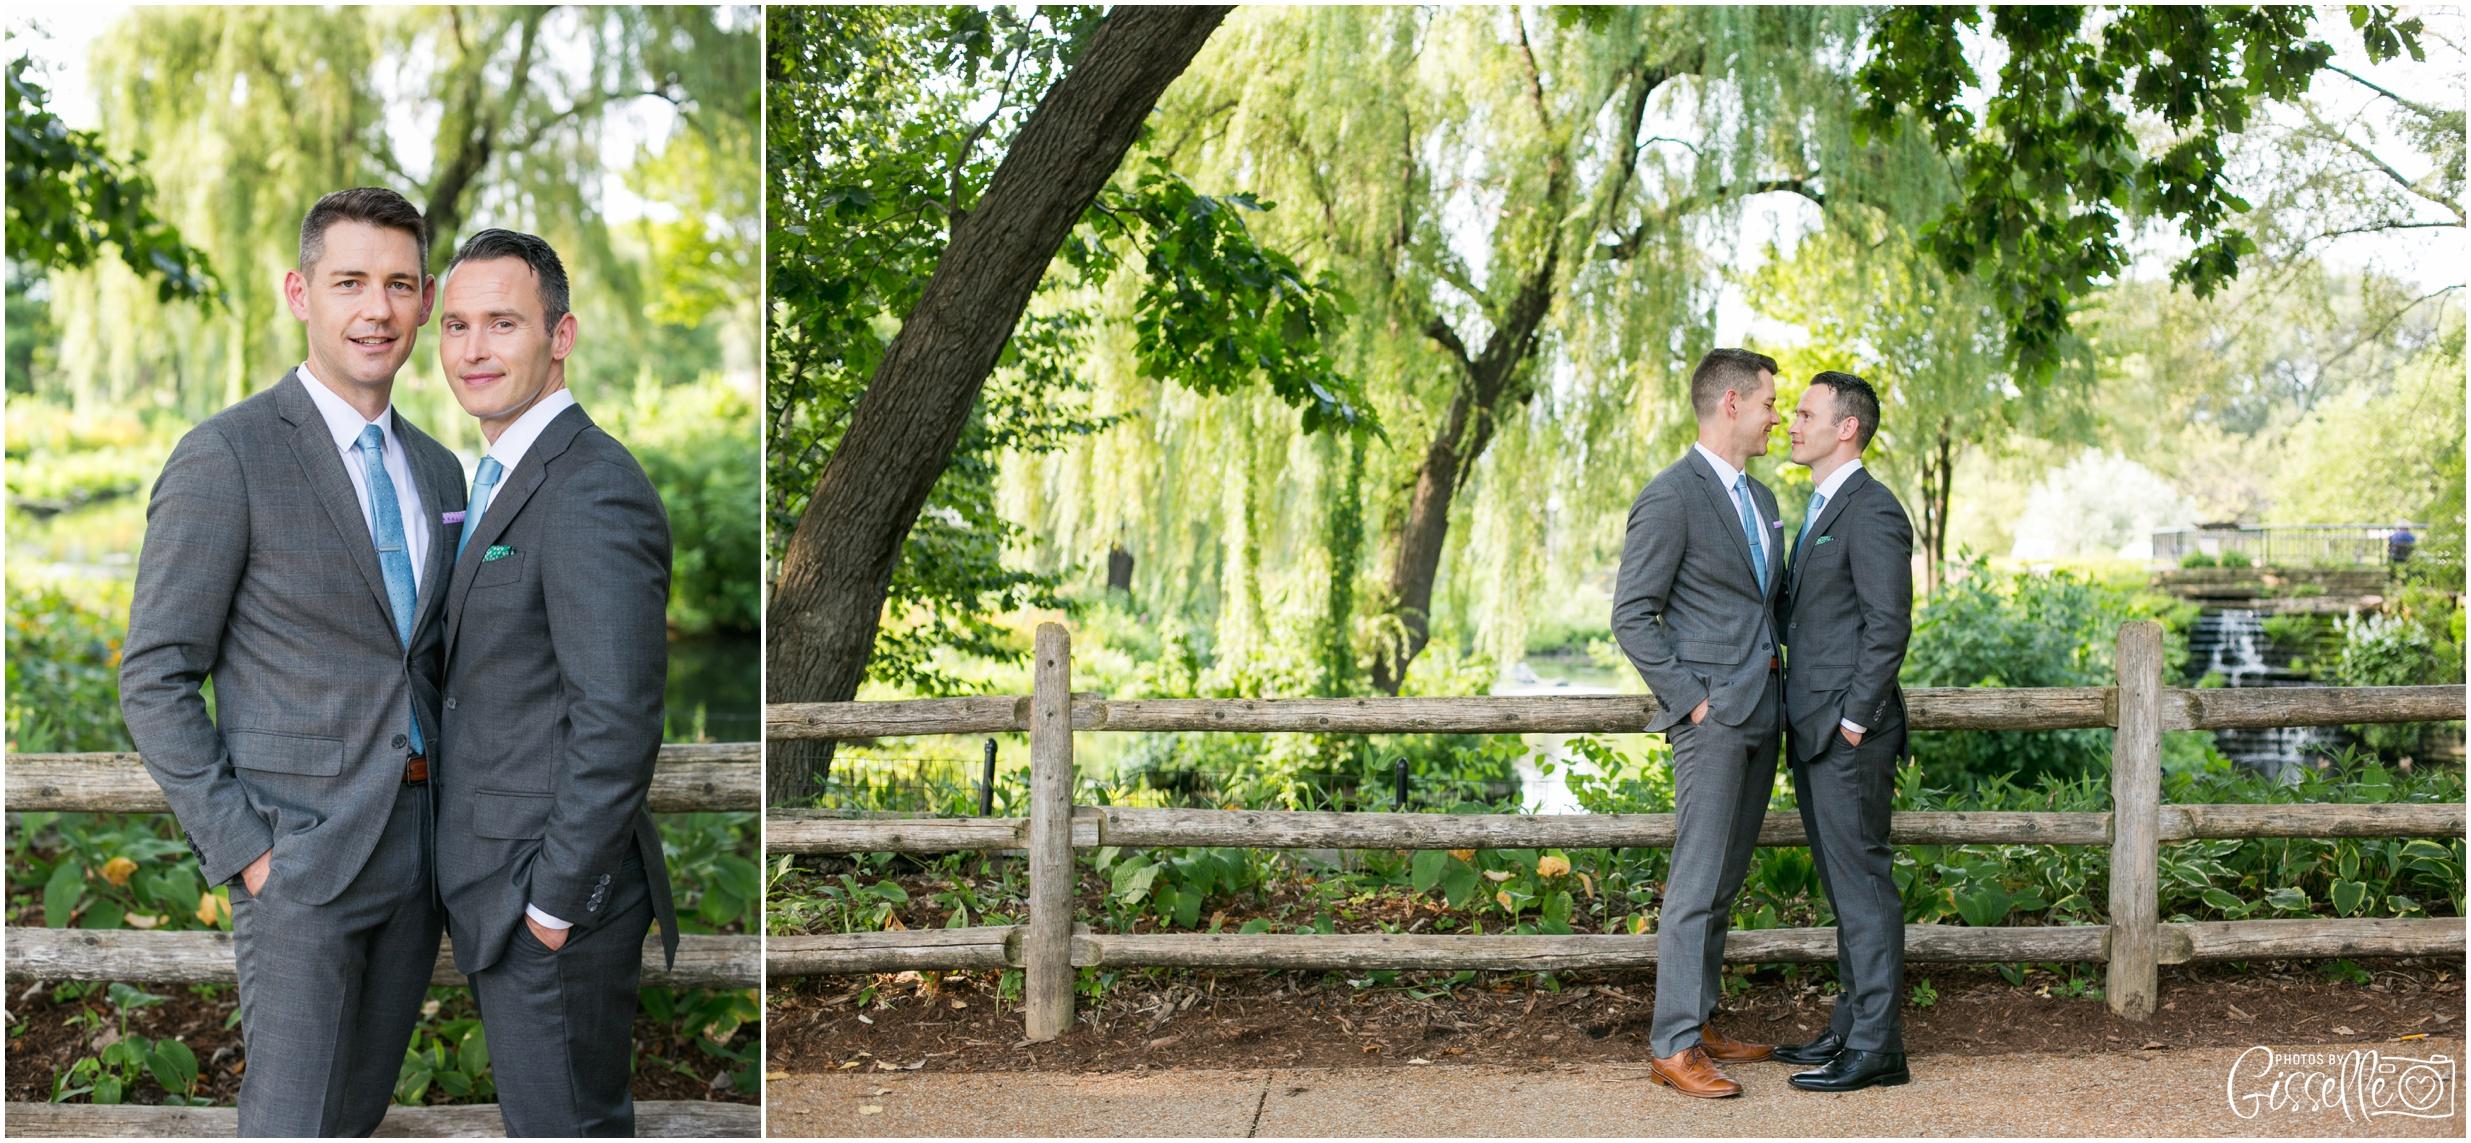 Lincoln Park Wedding_0002.jpg